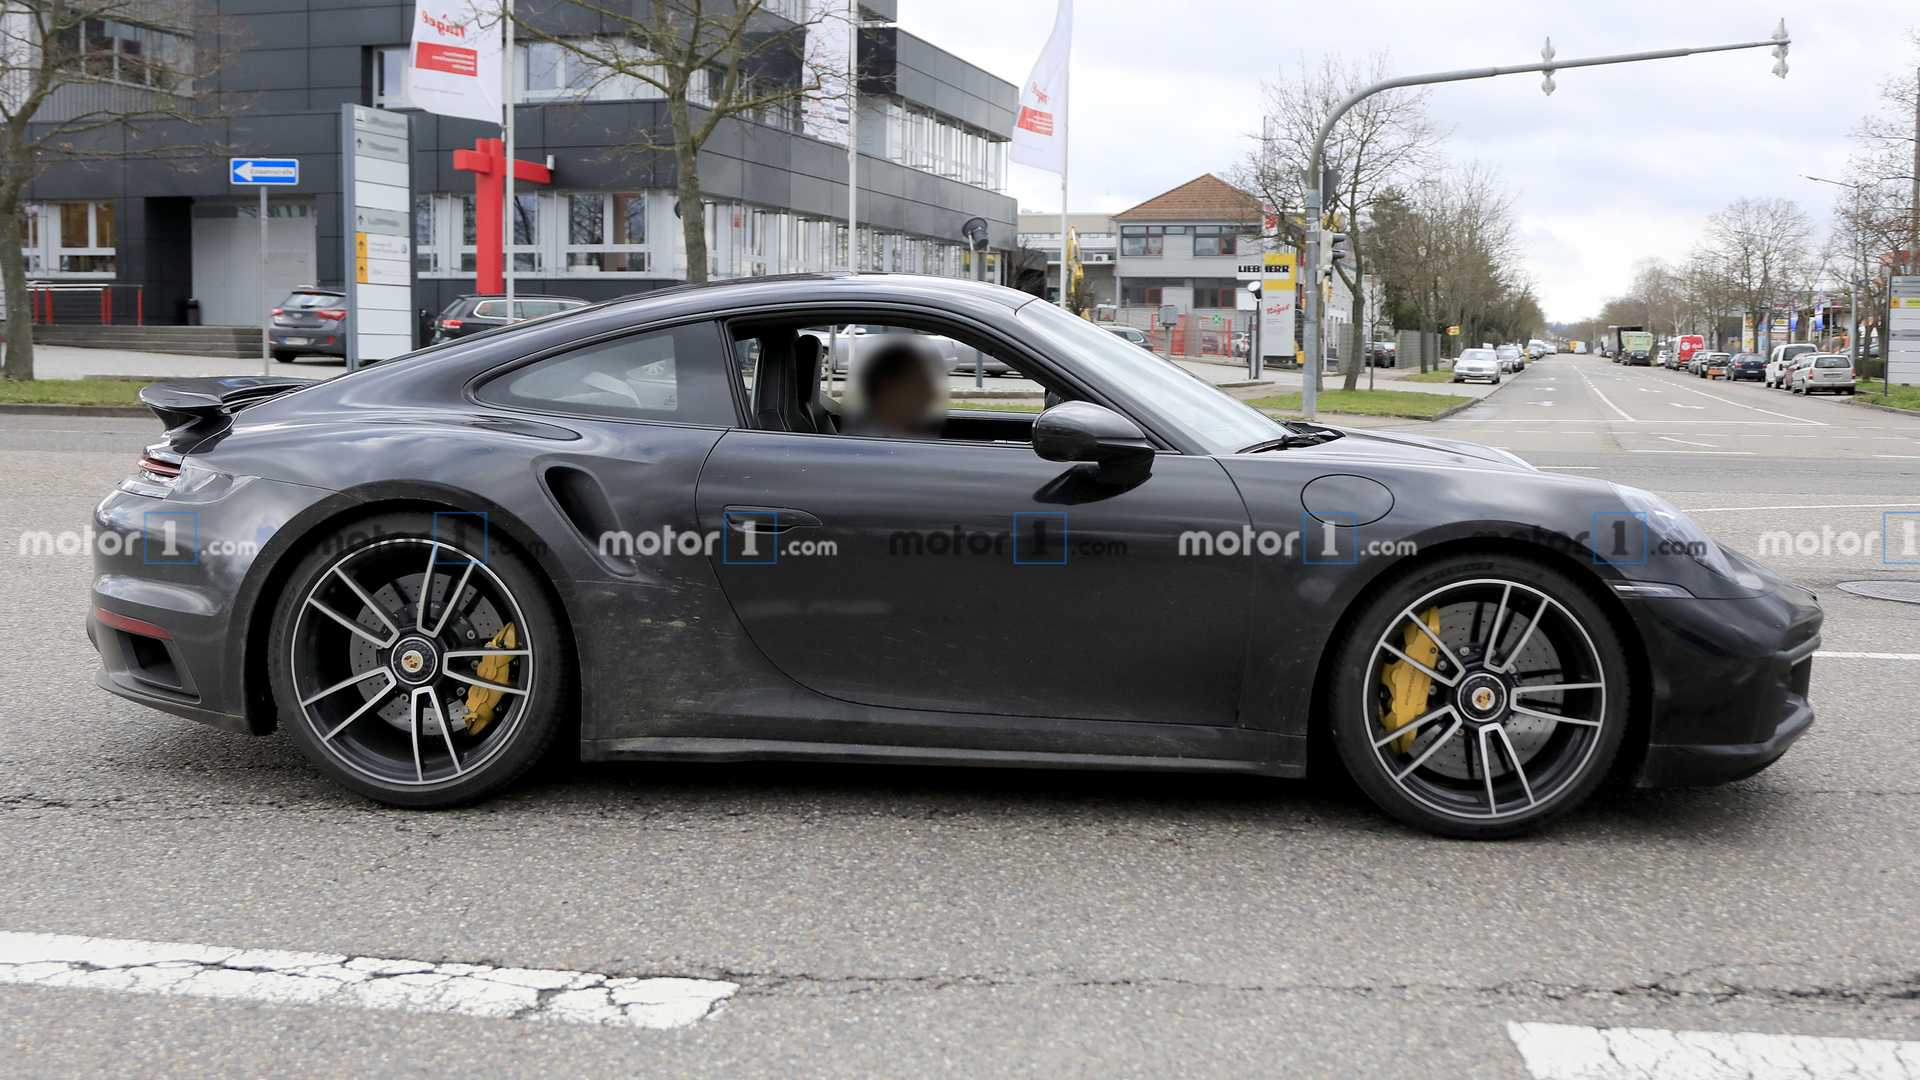 2018 - [Porsche] 911 - Page 17 Porsche-911-turbo-spy-photo